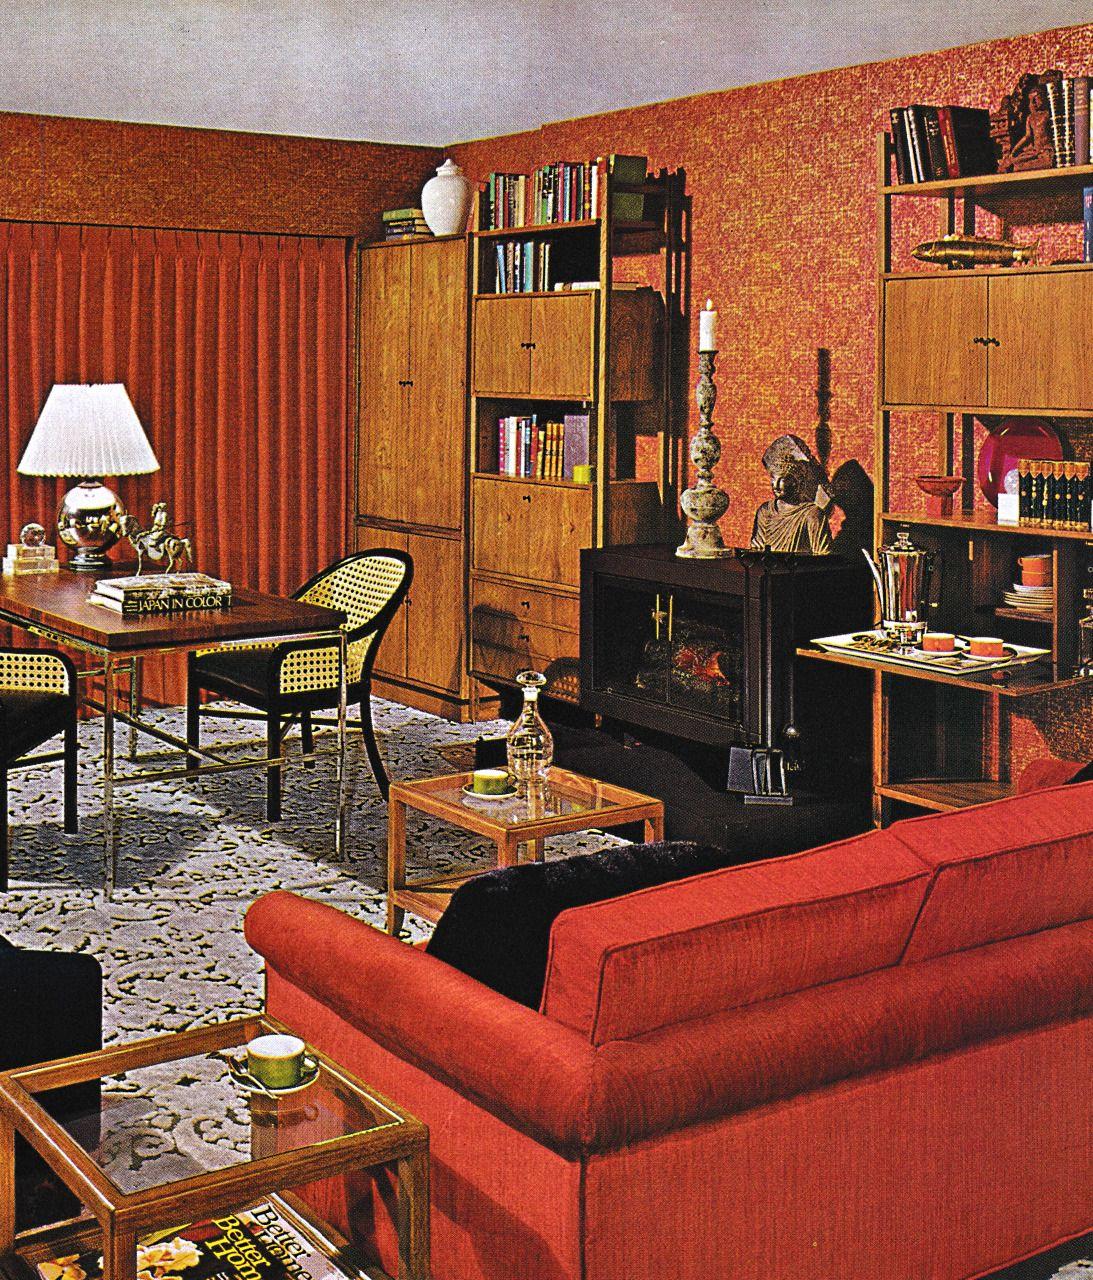 Thegikitiki 1970s Family Room Retro Home Decor Retro Home 70s Home Decor